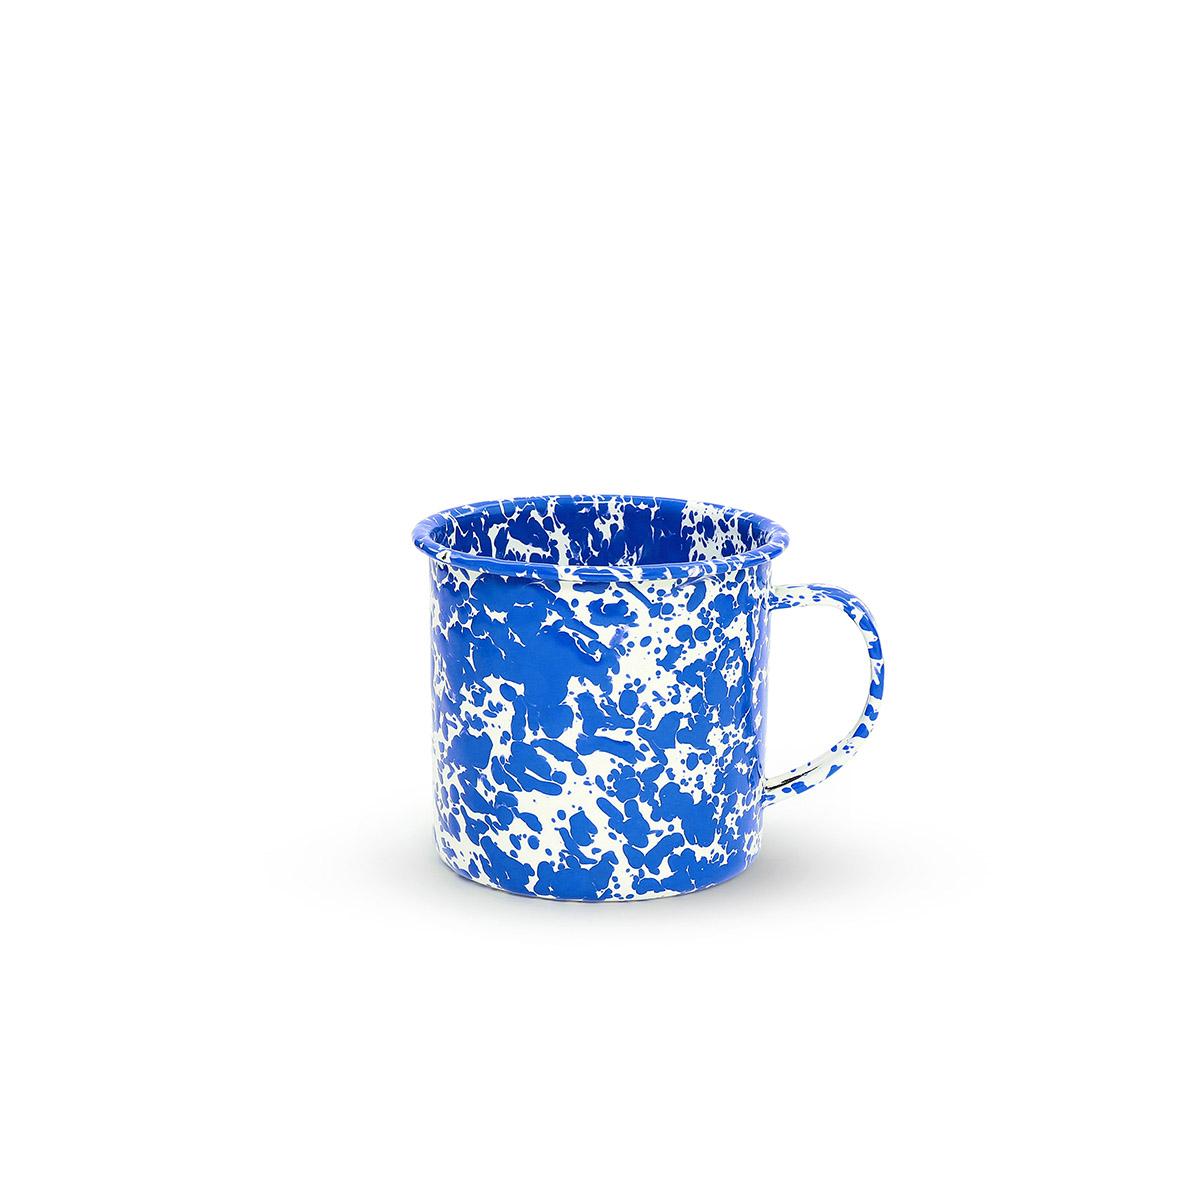 AIRMKT eCom Crow Canyon_24oz jumbo mug blue WEB